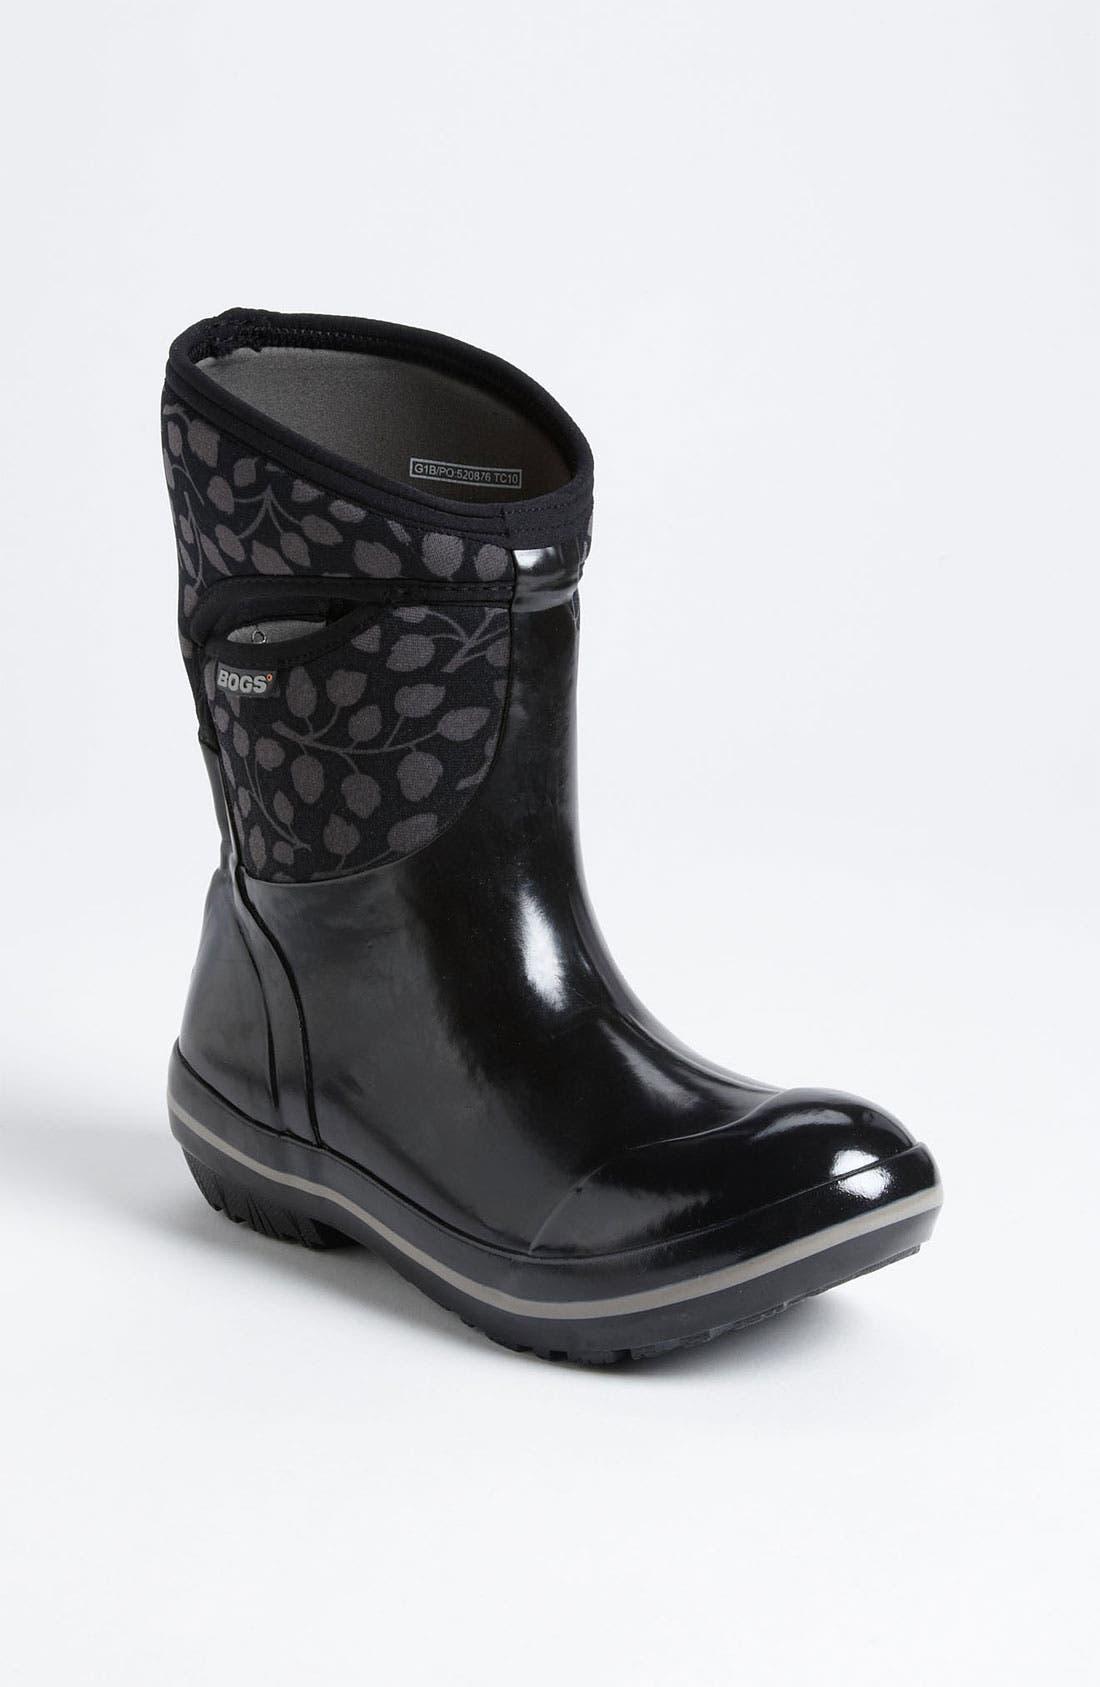 Alternate Image 1 Selected - Bogs 'Plimsoll Mid Leaf' Rain Boot (Women)